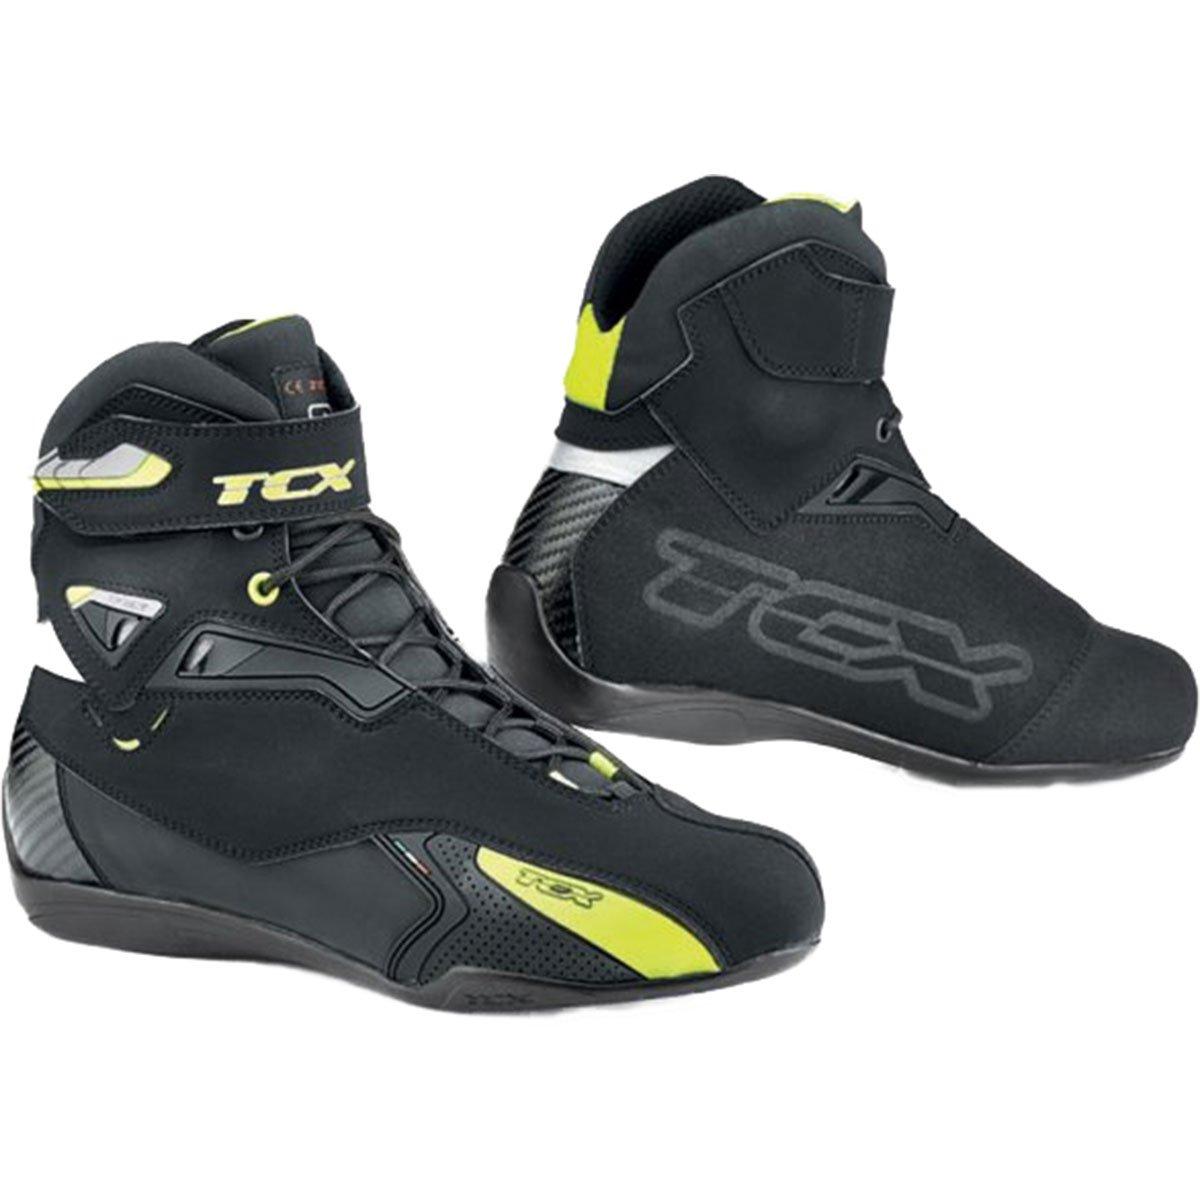 TCX Men's Rush Waterproof Street Motorcycle Boots - Black/Yellow Size 48